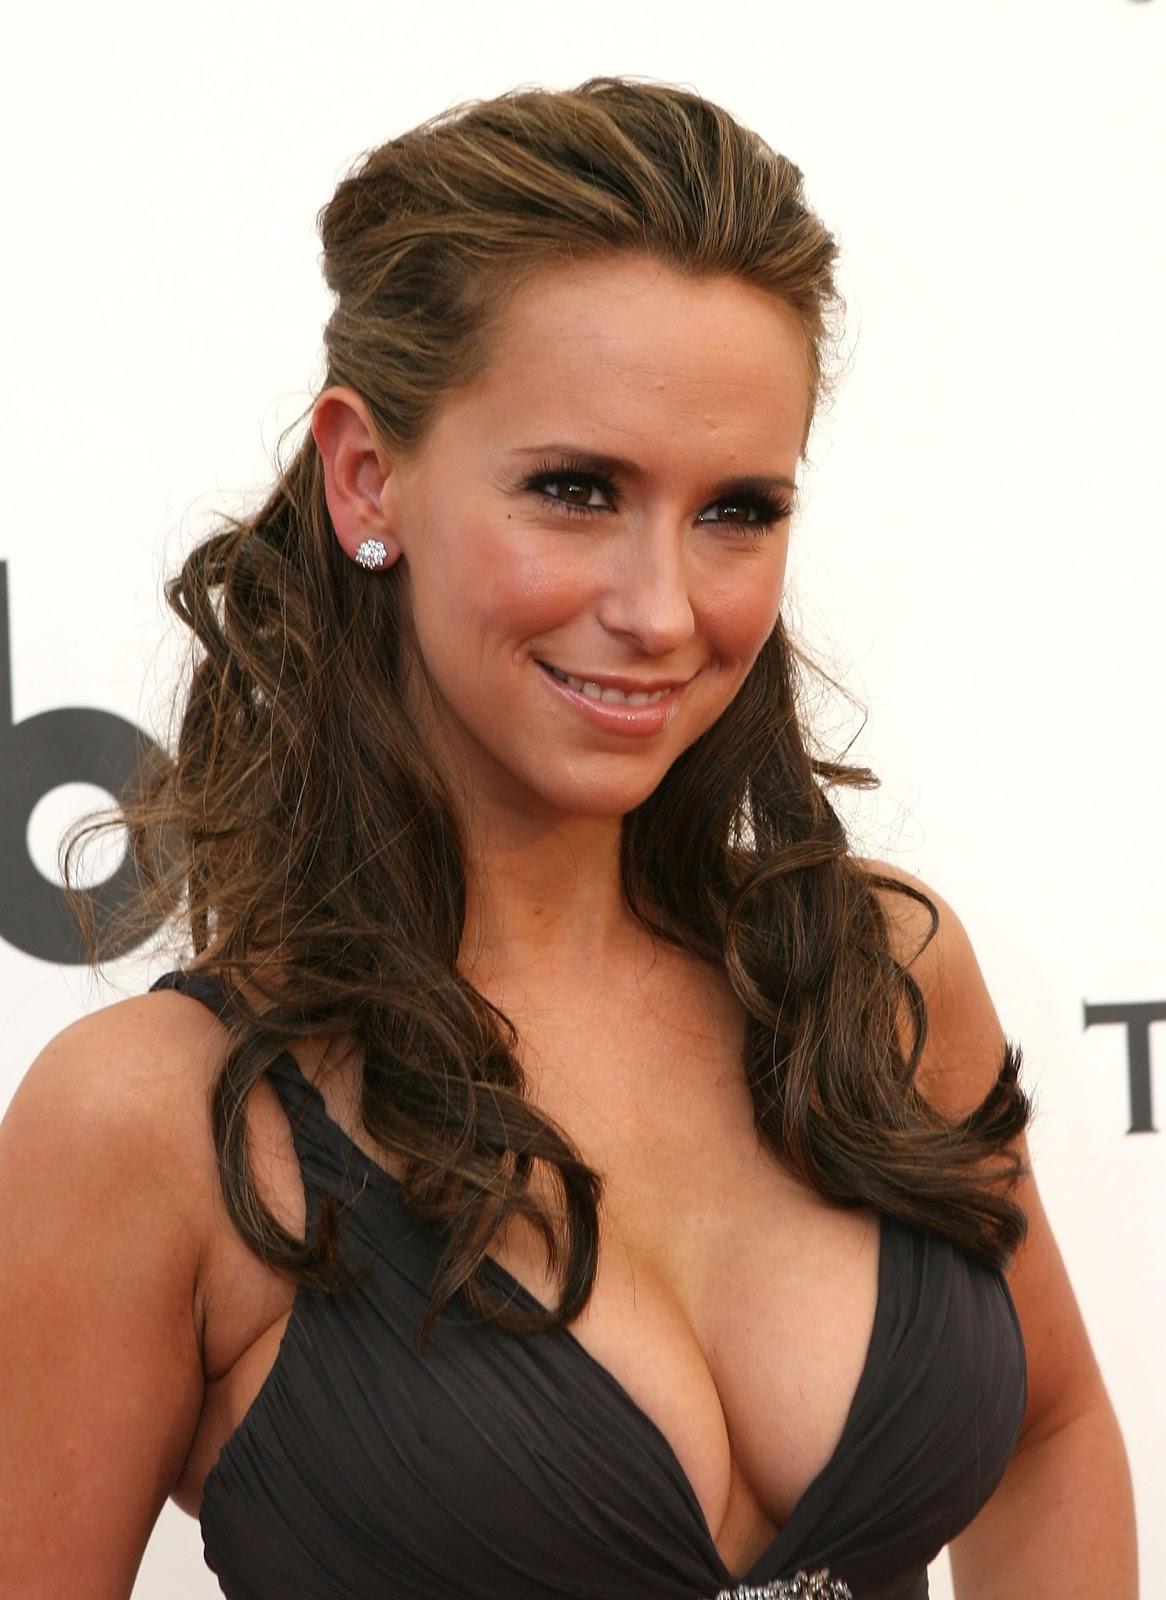 http://1.bp.blogspot.com/-dOiOqN2S_xI/T9Dwr1VacBI/AAAAAAAAA3Y/k42MU1MdHp0/s1600/Jennifer-Love-Hewitt-Strips-Down-to-Promote.jpg